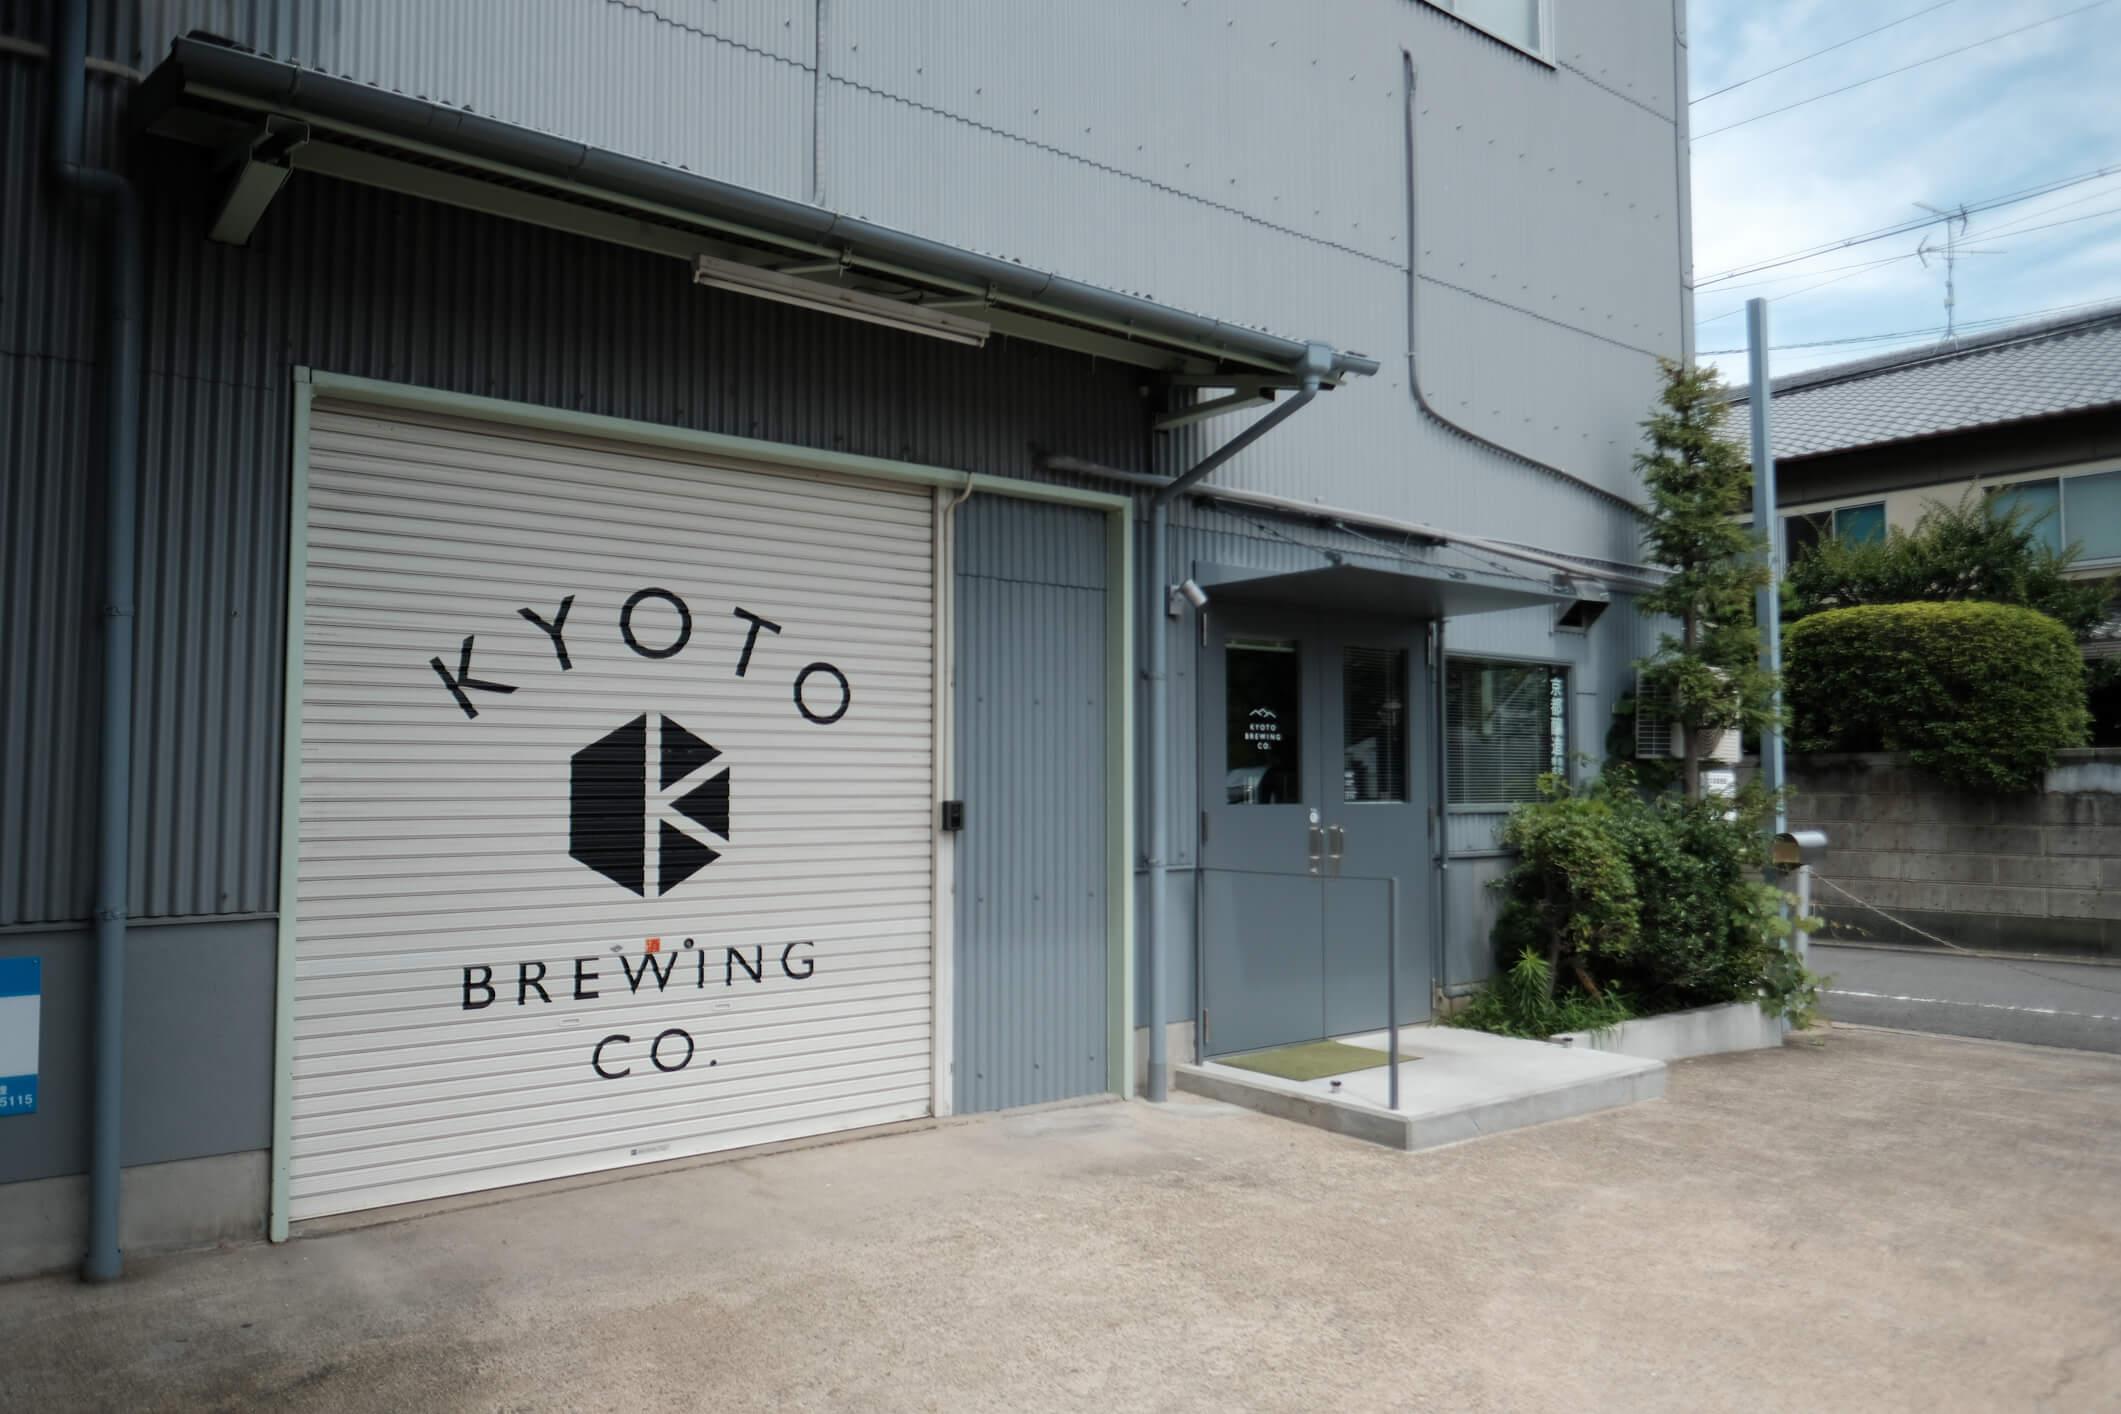 KYOTO BREWING CO.